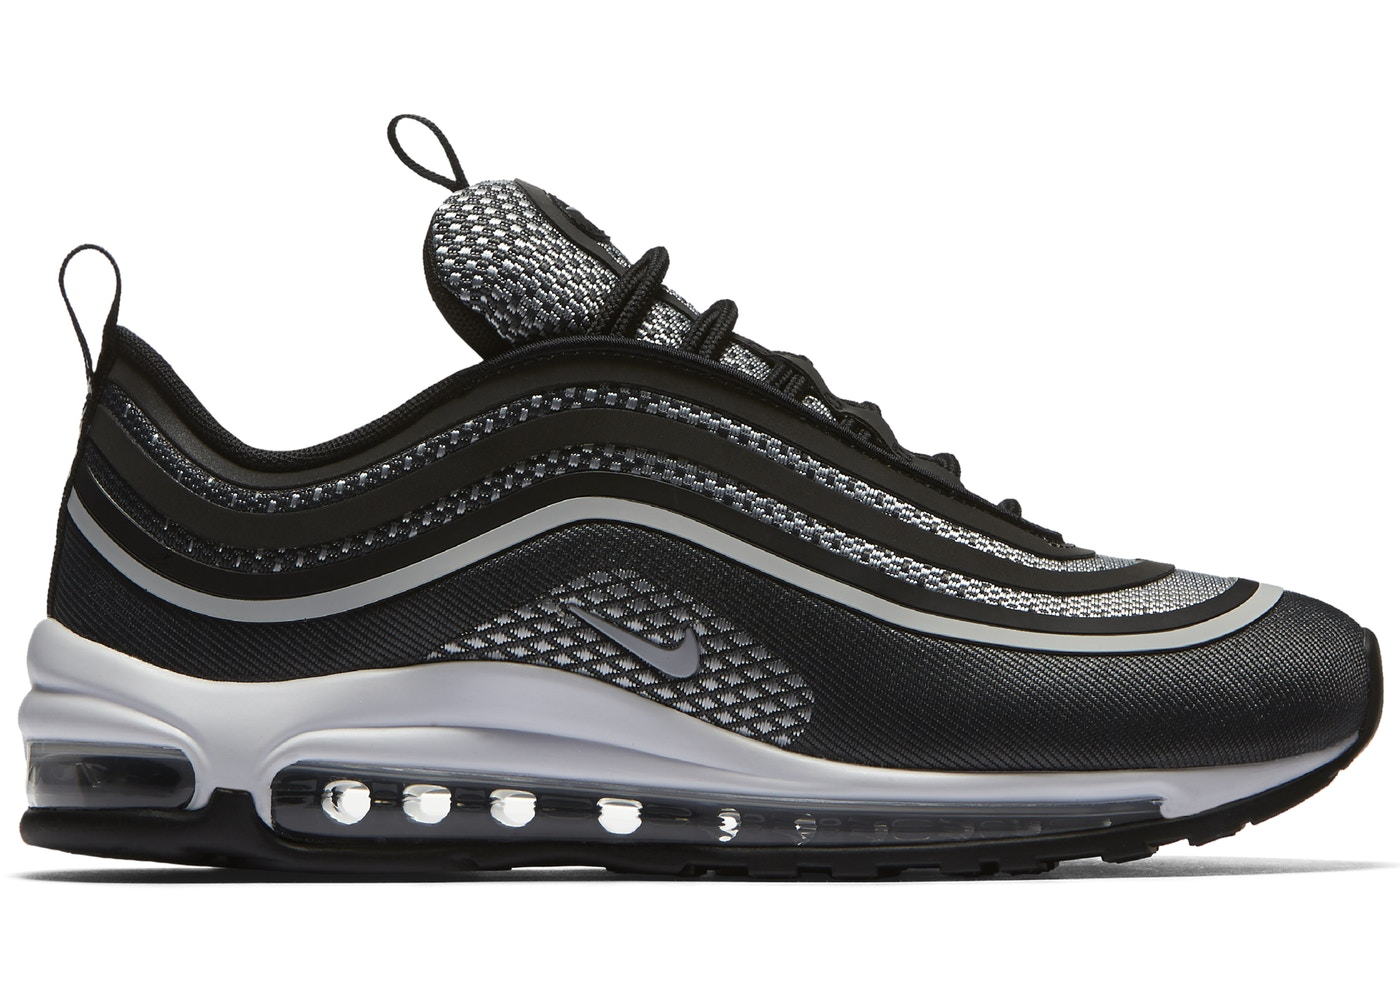 Nike Air Max 97 Ultra 17 Black Pure Platinum (W)